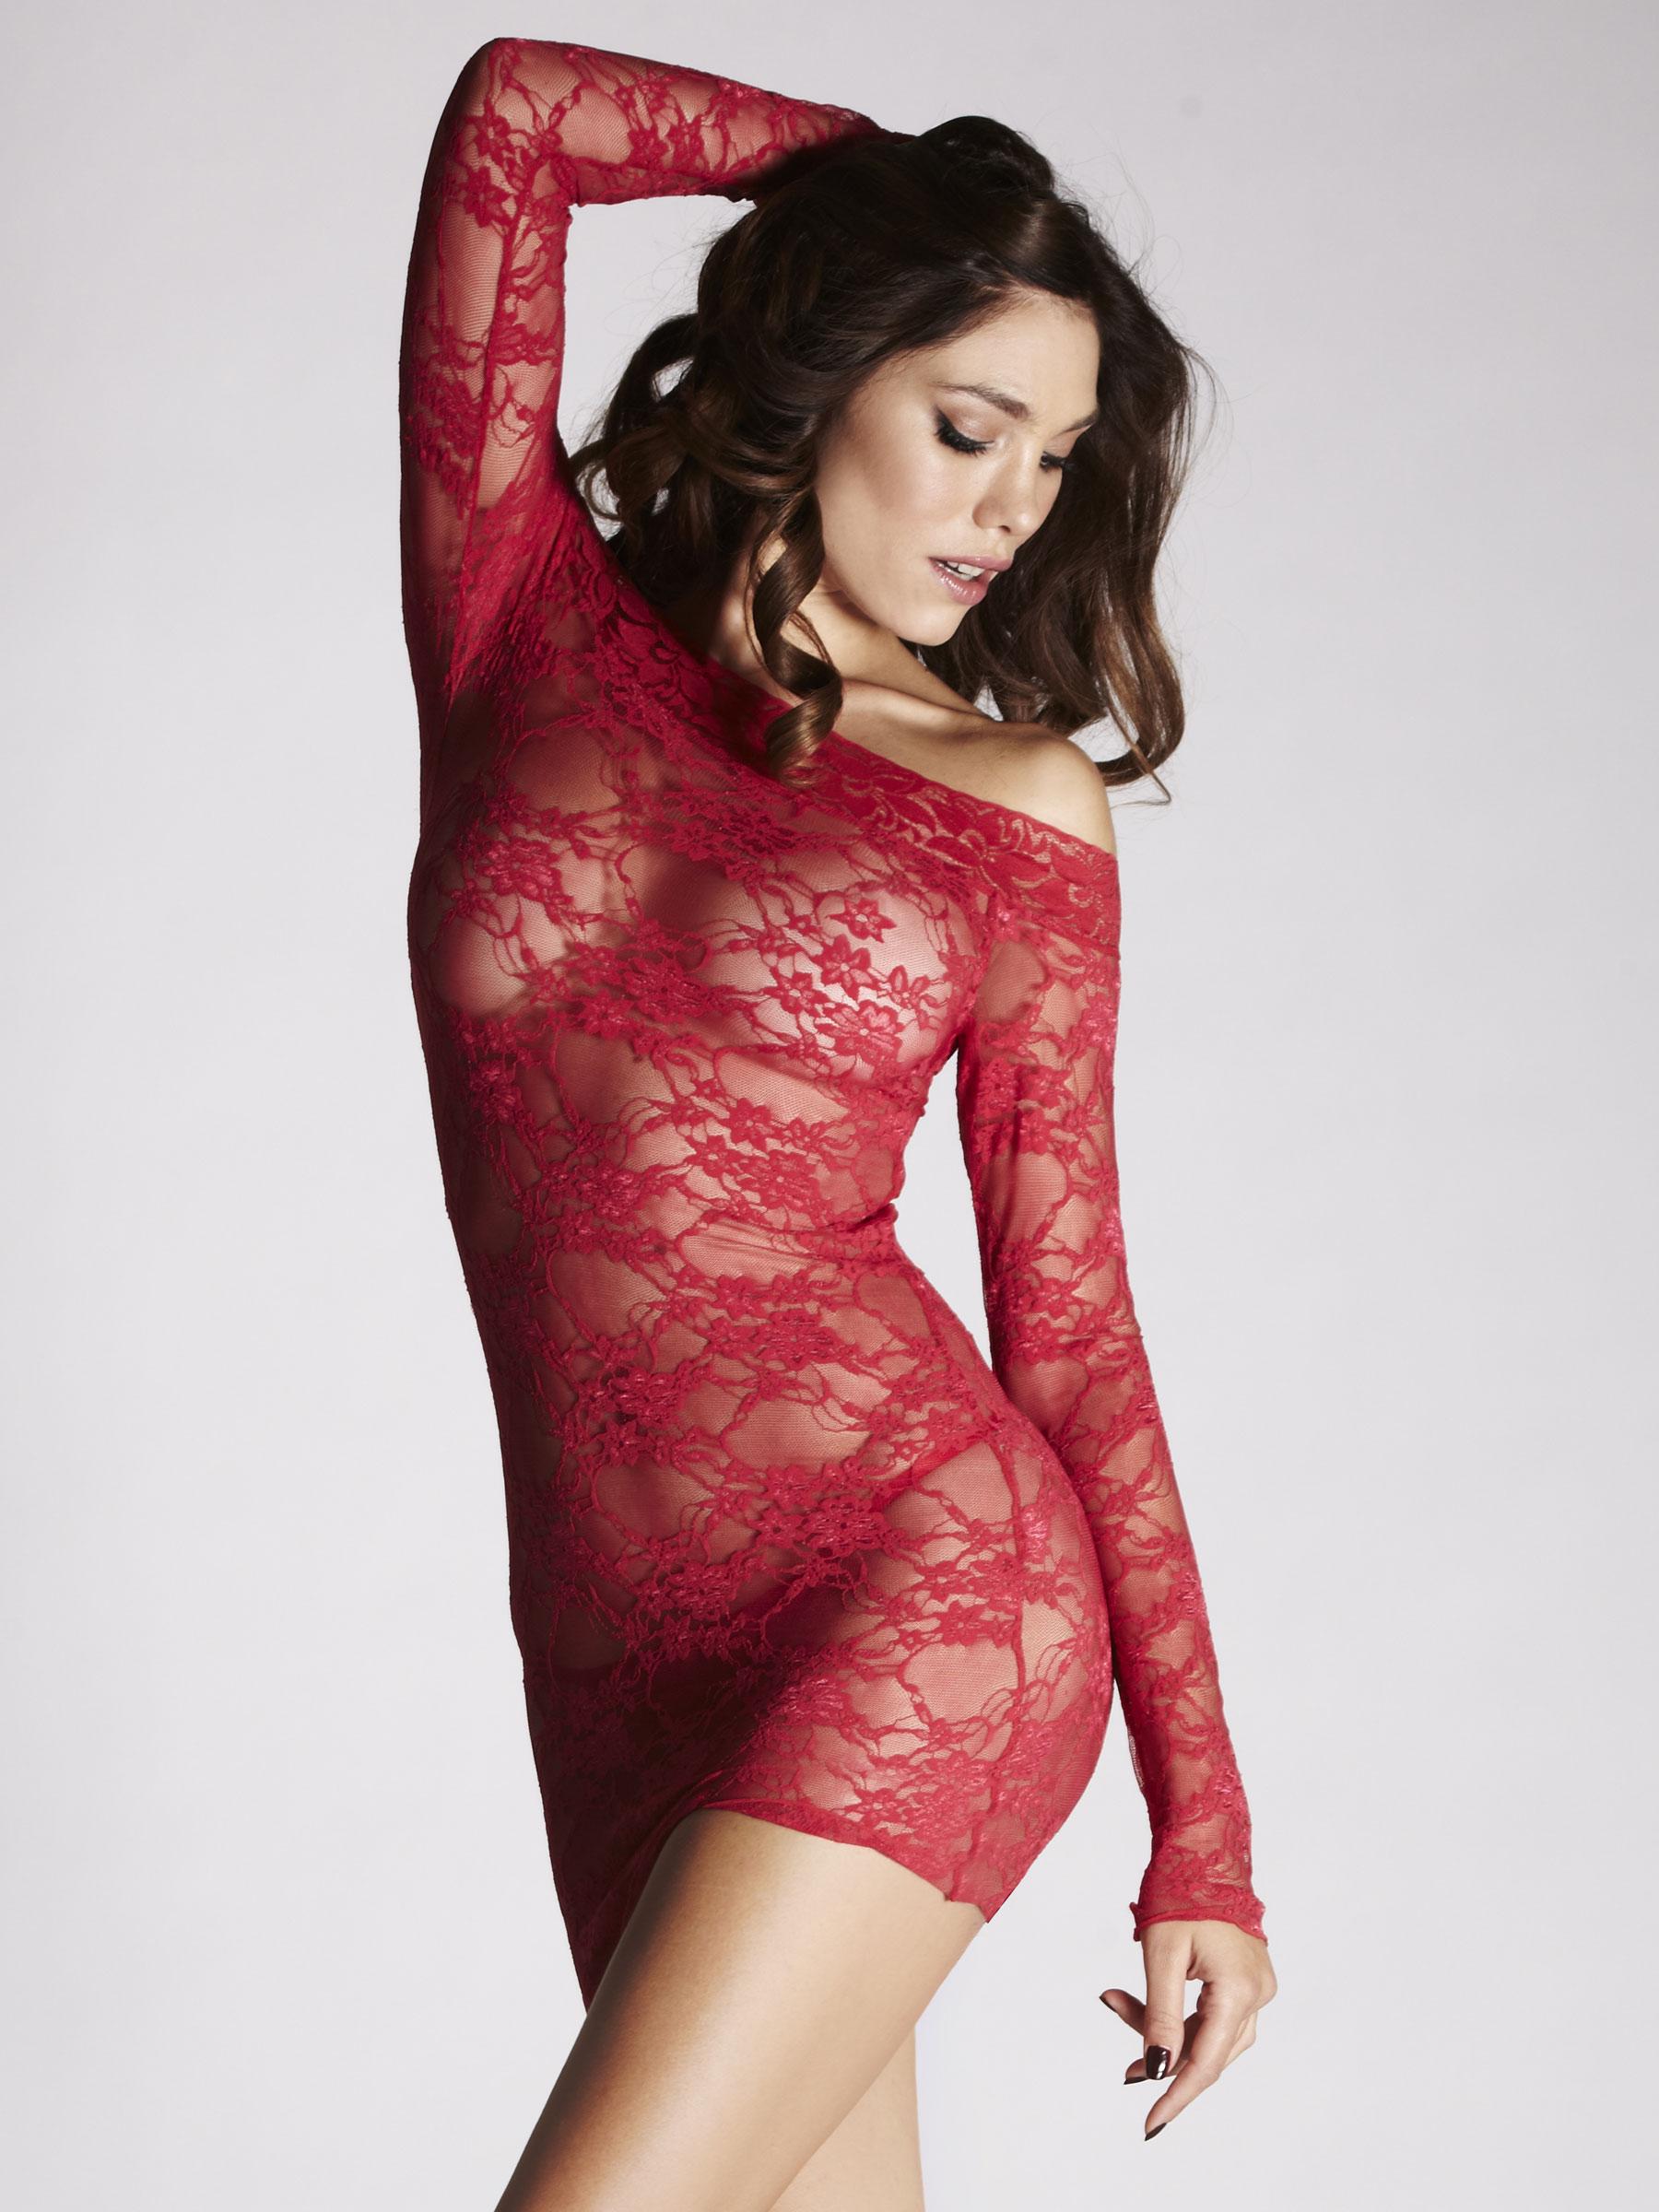 red lingerie pics